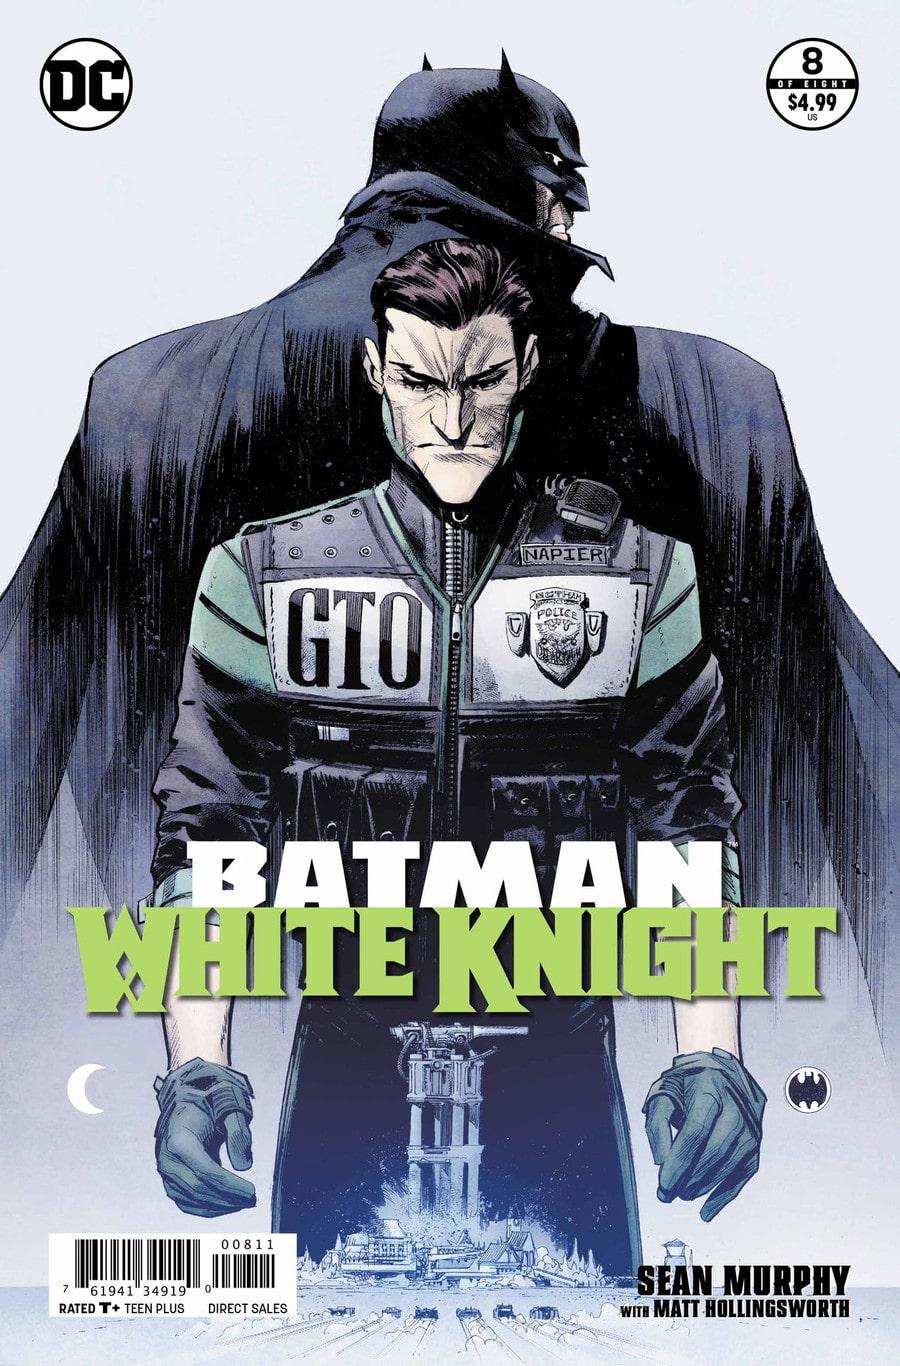 Batman et Harley Quinn porno comique